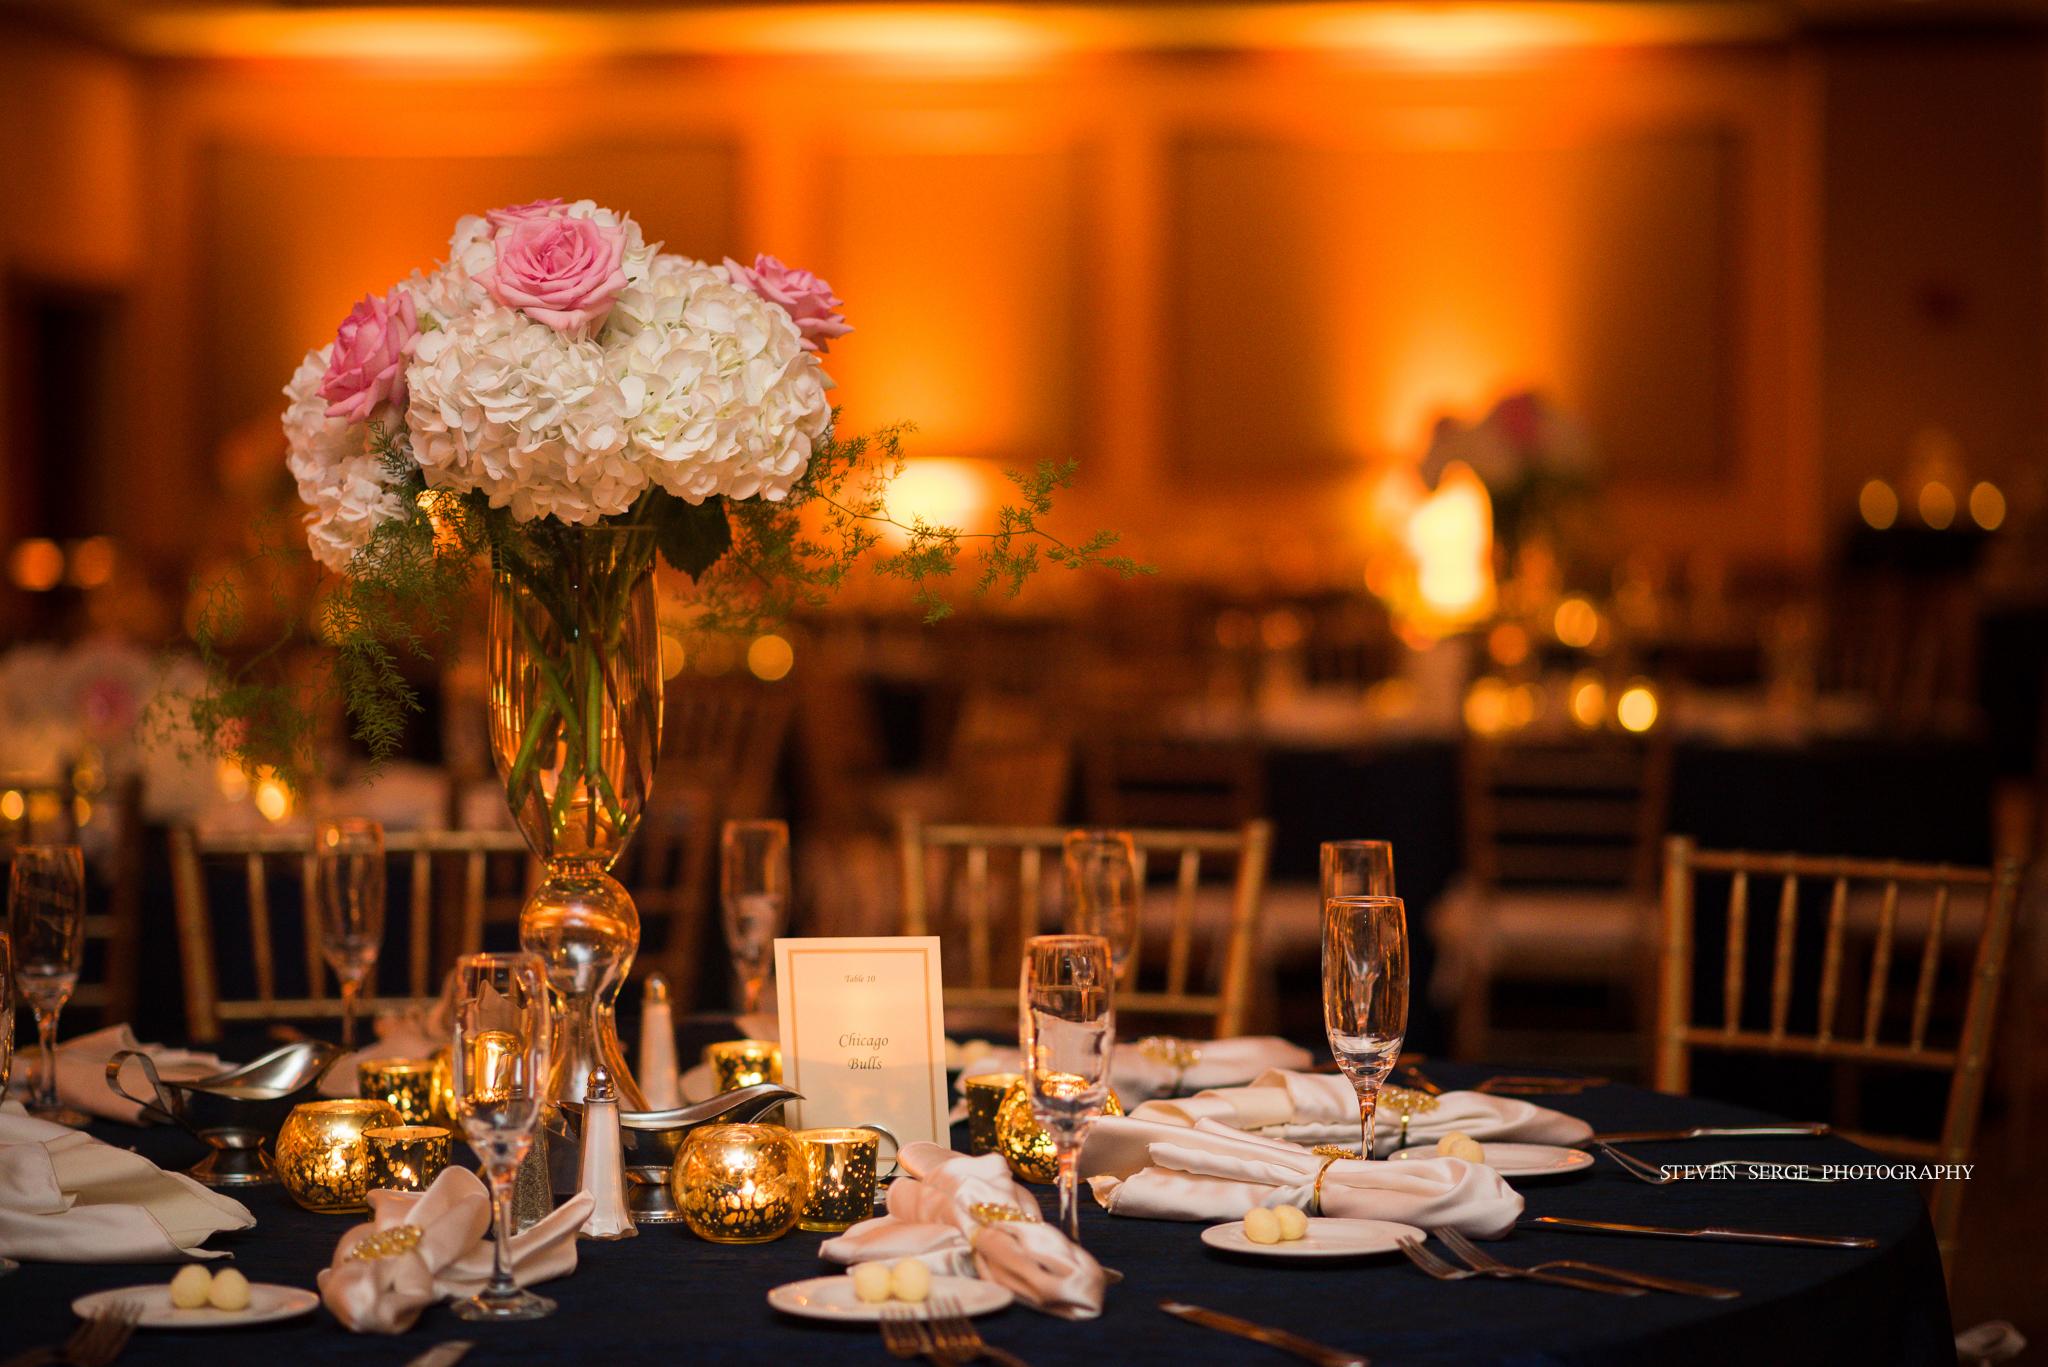 scranton-wedding-photographers-hilton-steven-serge-photography-2.jpg